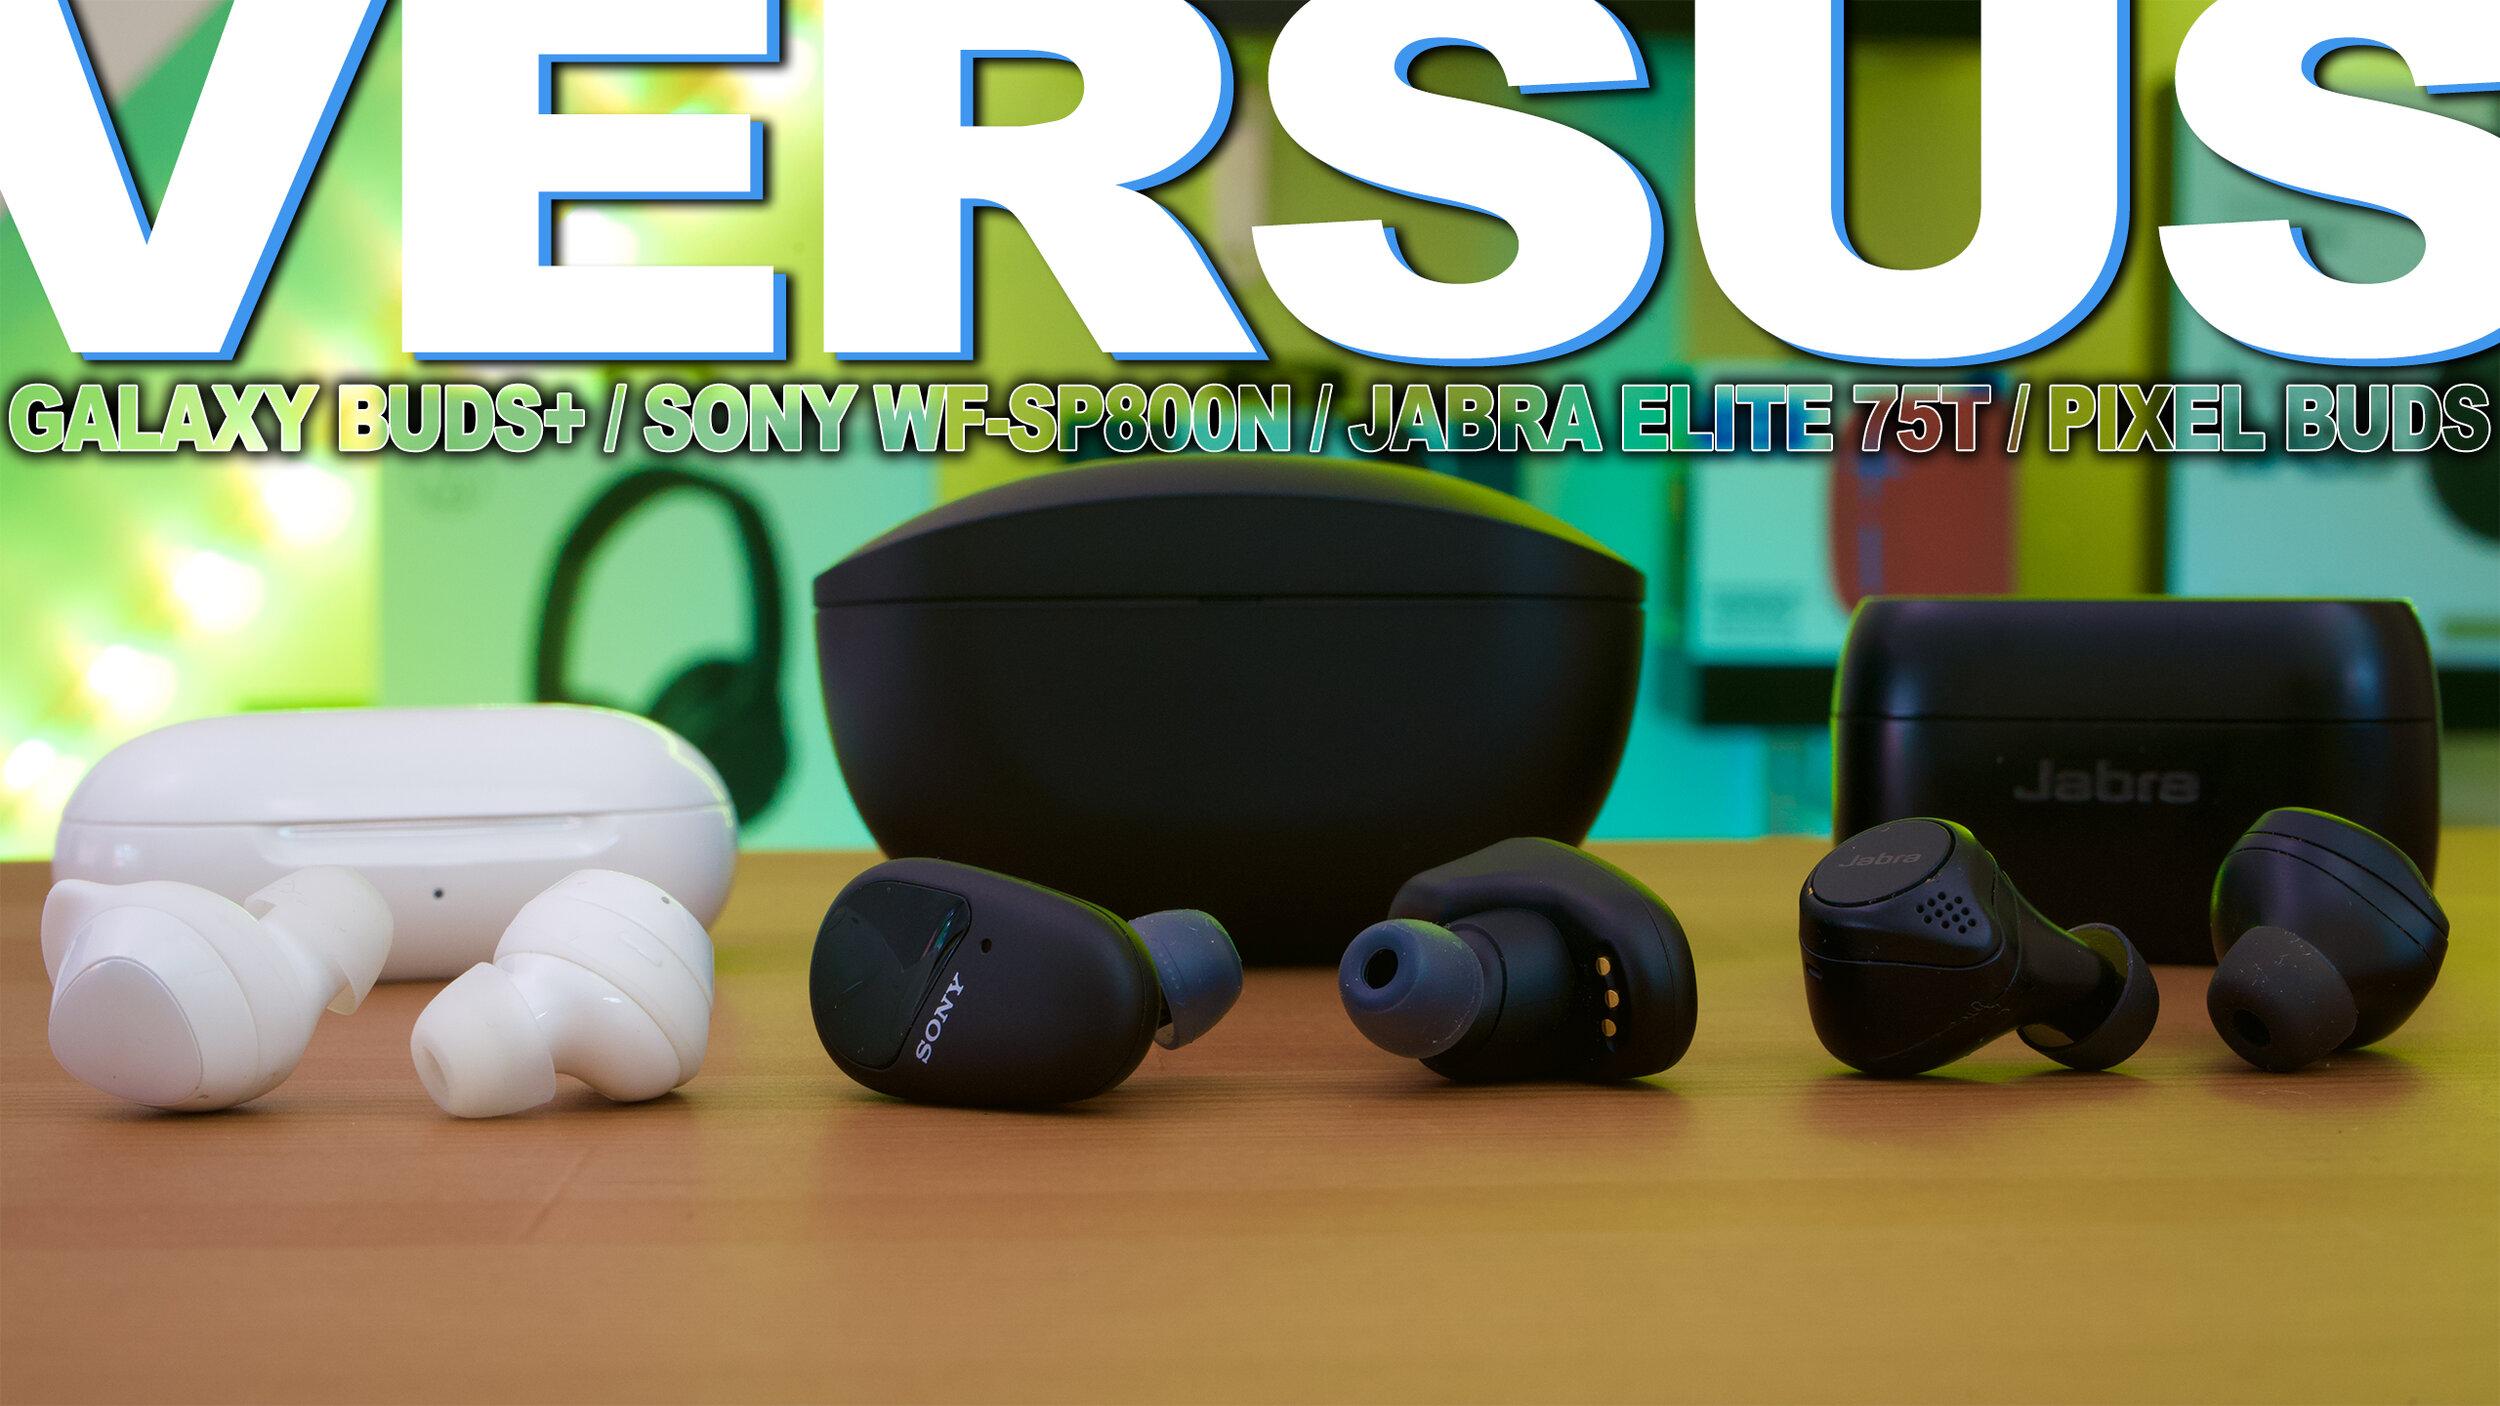 Sony Wf Sp800n Vs Galaxy Buds Vs Jabra Elite 75t Vs Google Pixel Buds Gymcaddy